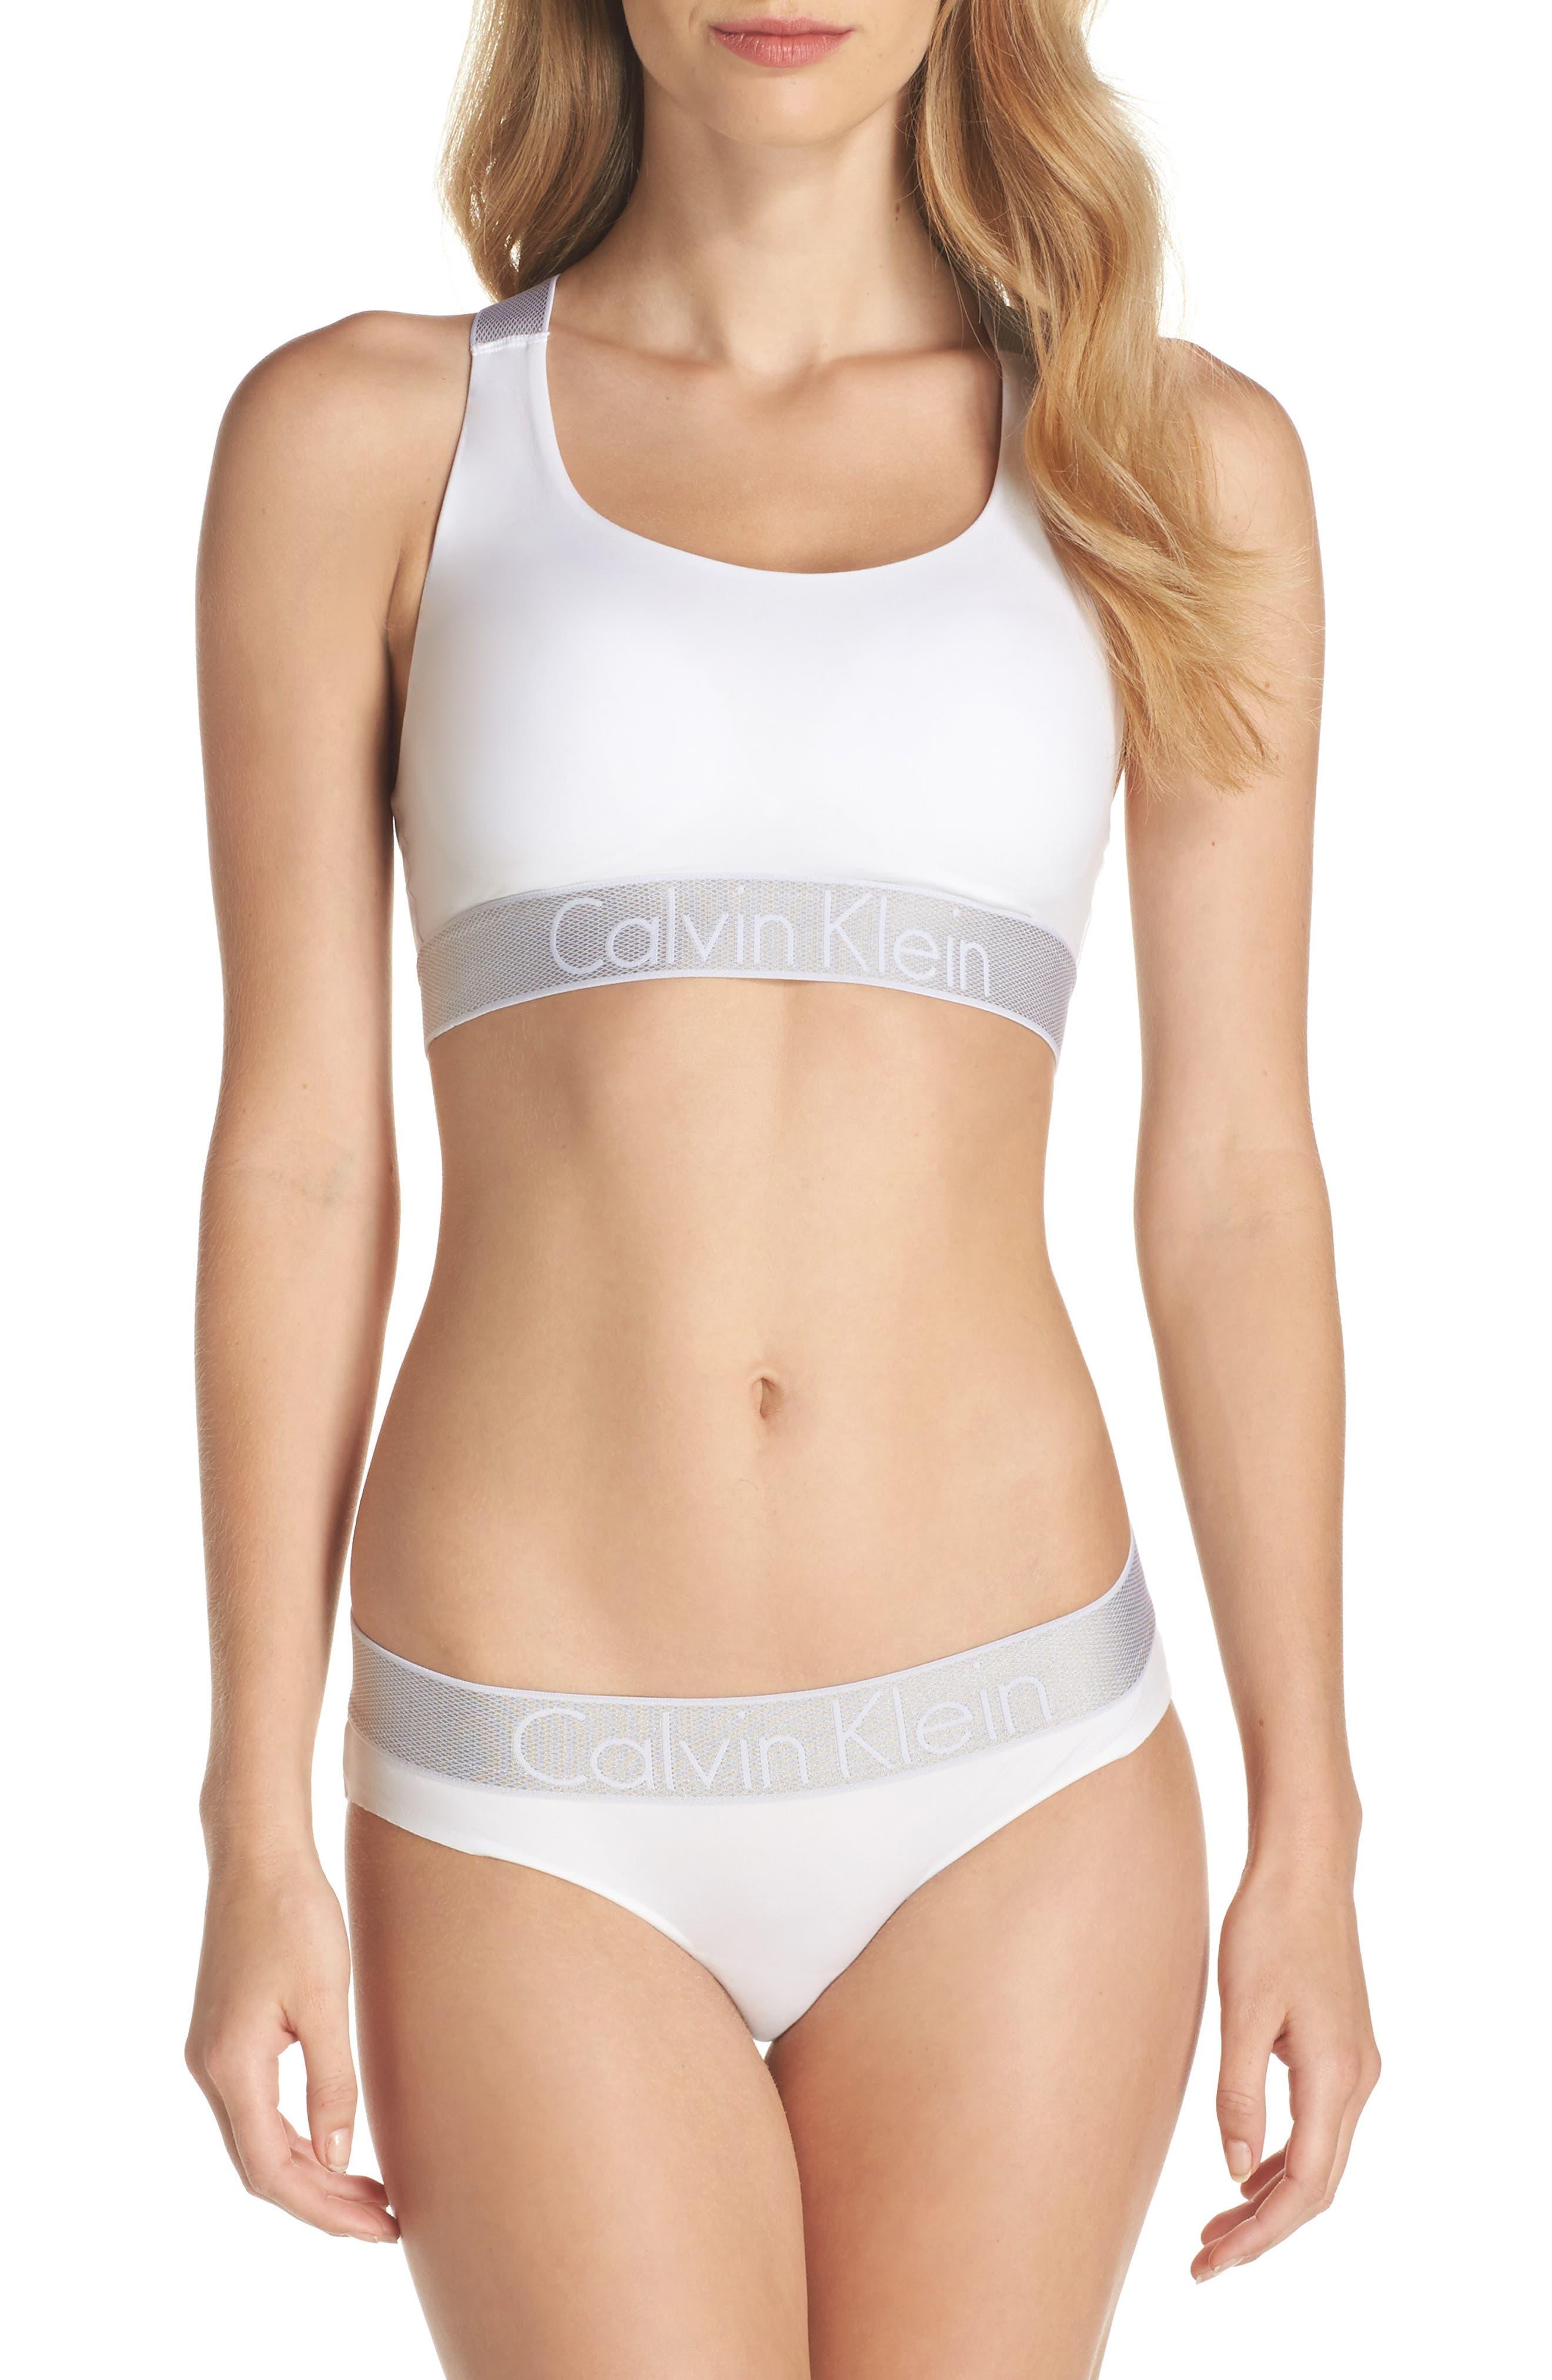 Calvin Klein Bra & Bikini